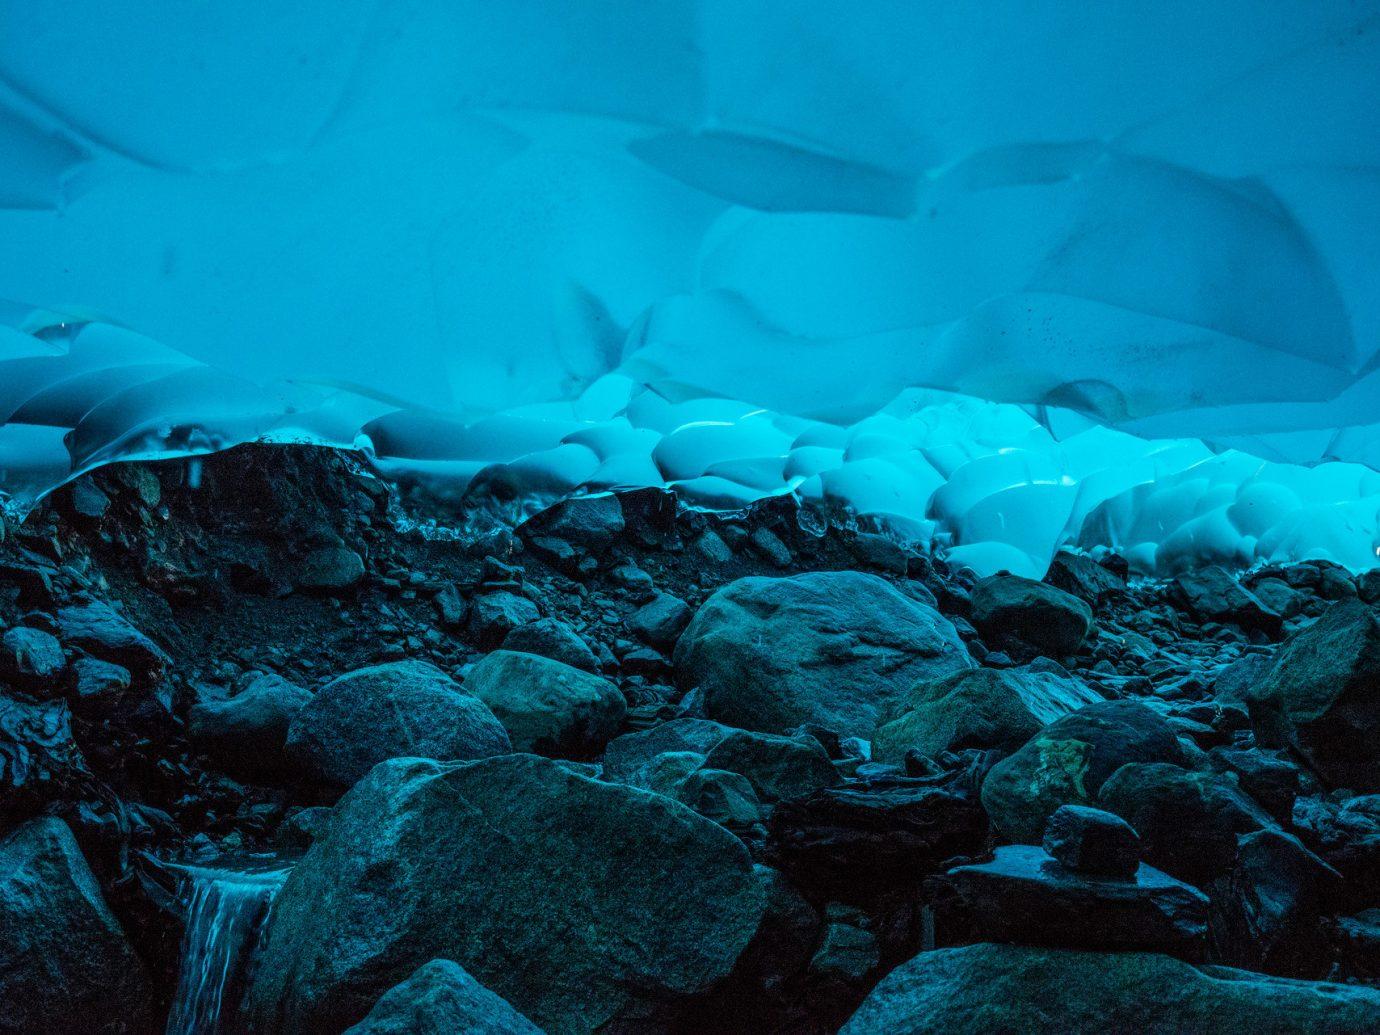 blue calm Design glaciers ice ice cave majestic Nature remote Scenic views serene Trip Ideas animal geographical feature landform marine biology Ocean cave glacial landform iceberg formation underwater arctic ocean Sea fish